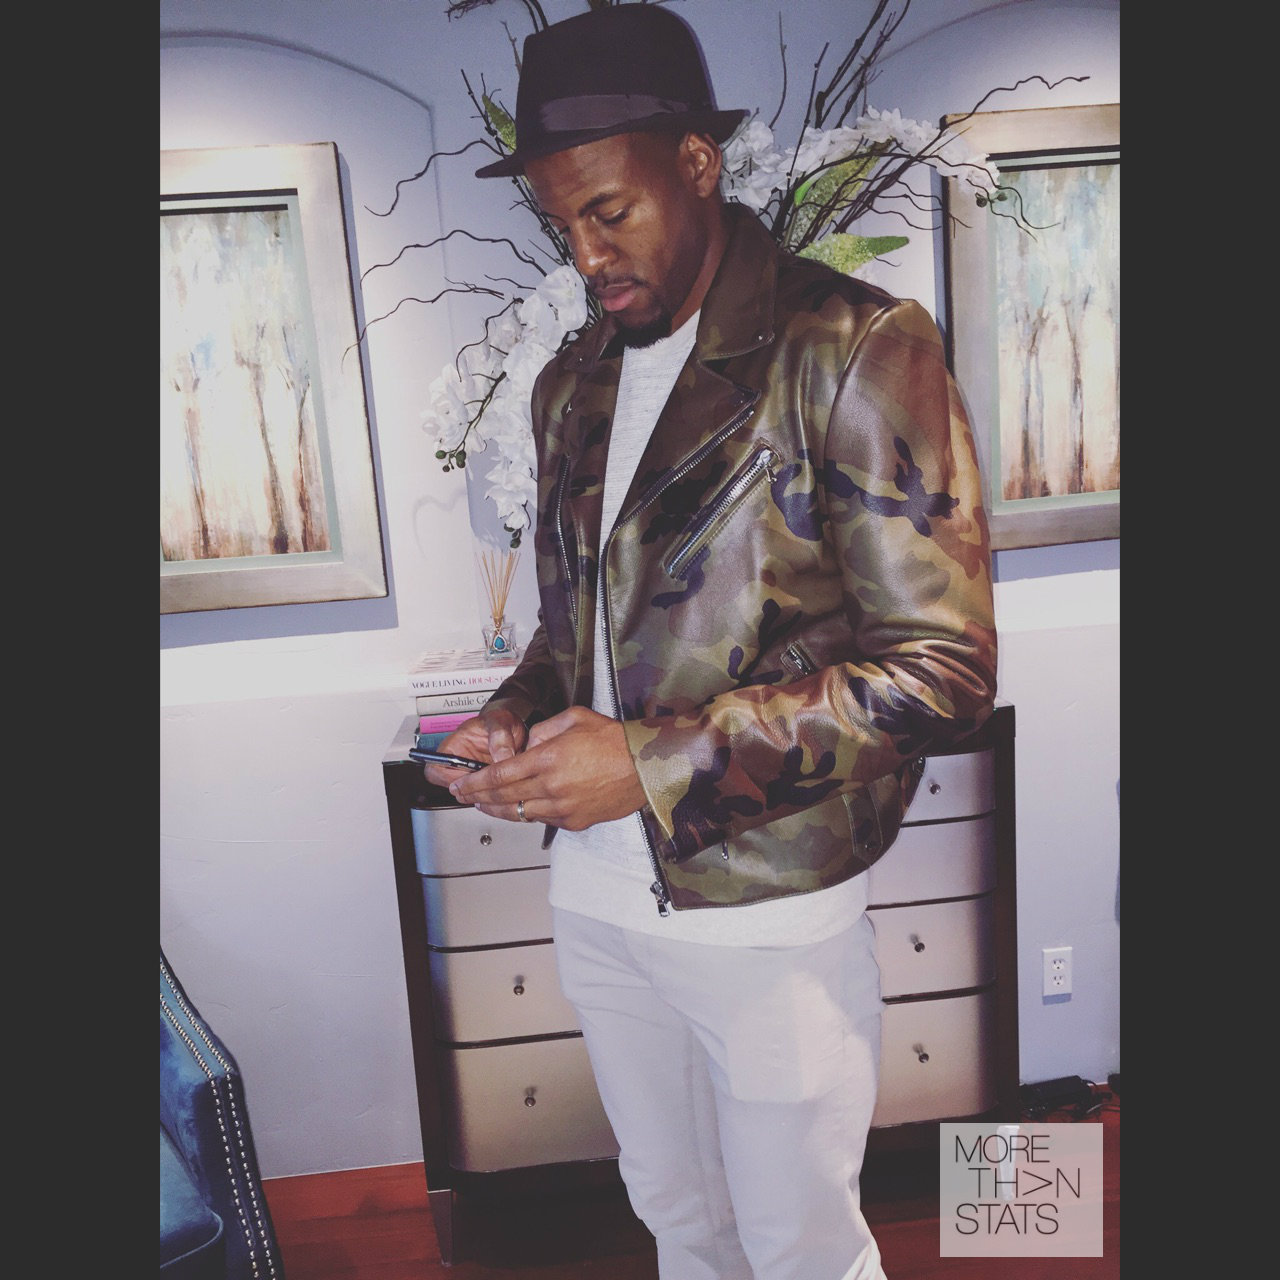 STYLE: Andre Iguodala's Instagram Pyer Moss 'Killer' Camouflage Biker Jacket